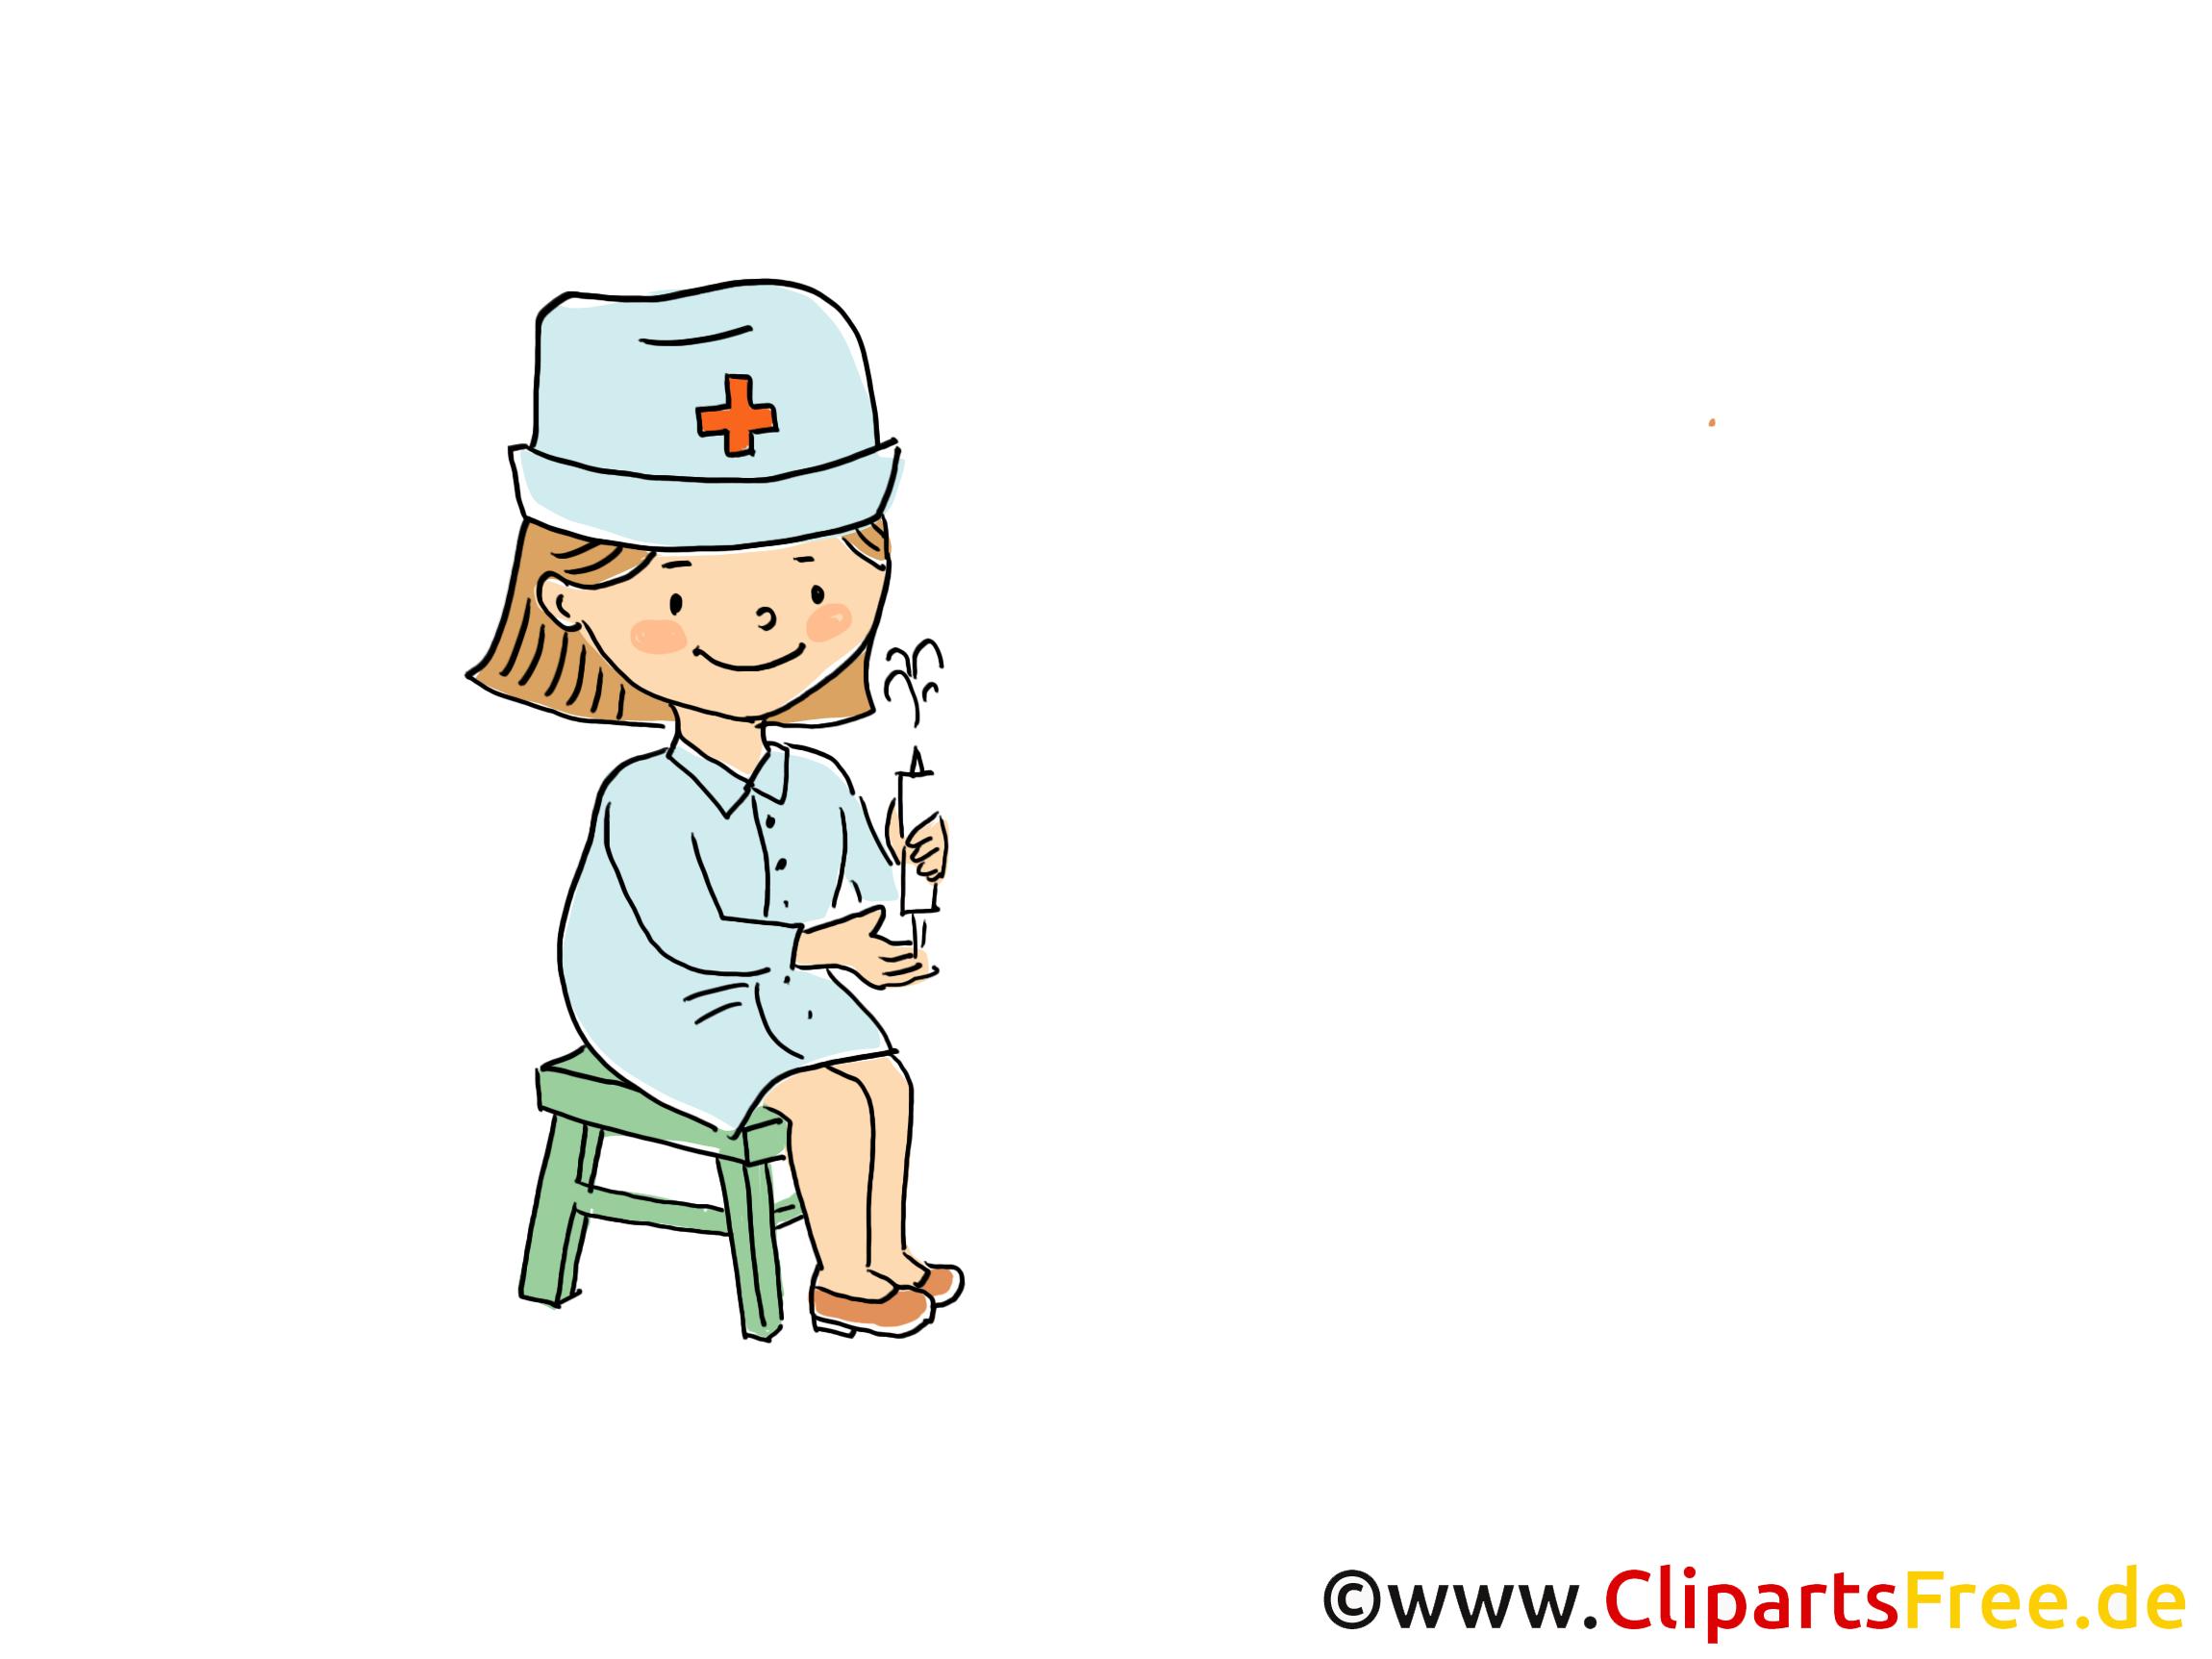 Krankenschwester im Kindergarten Bild, Clipart, Cartoon, Grafik ...